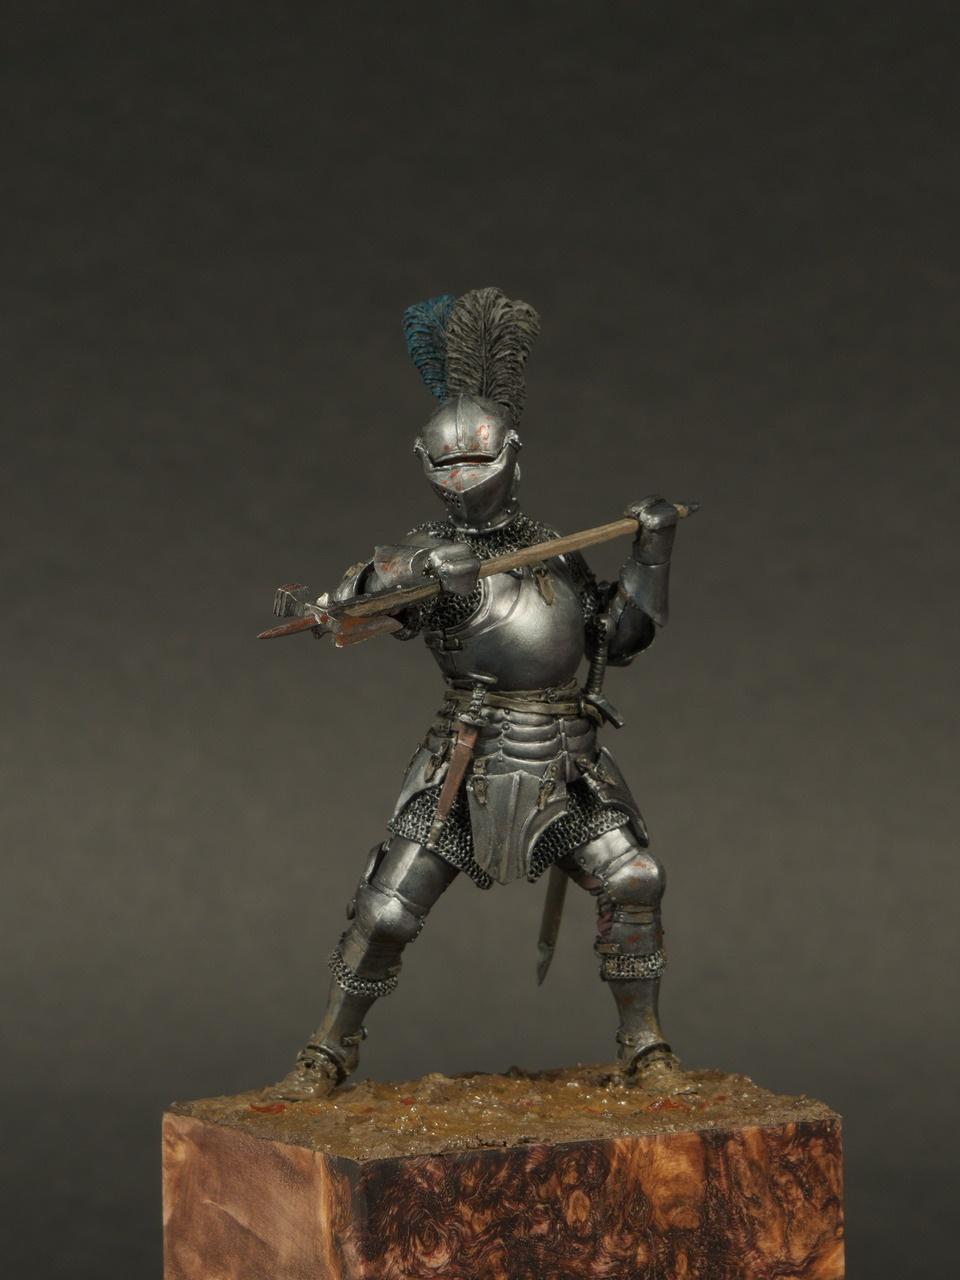 Burgundian knight 15th century by Alexey Kazakov · Putty&Paint